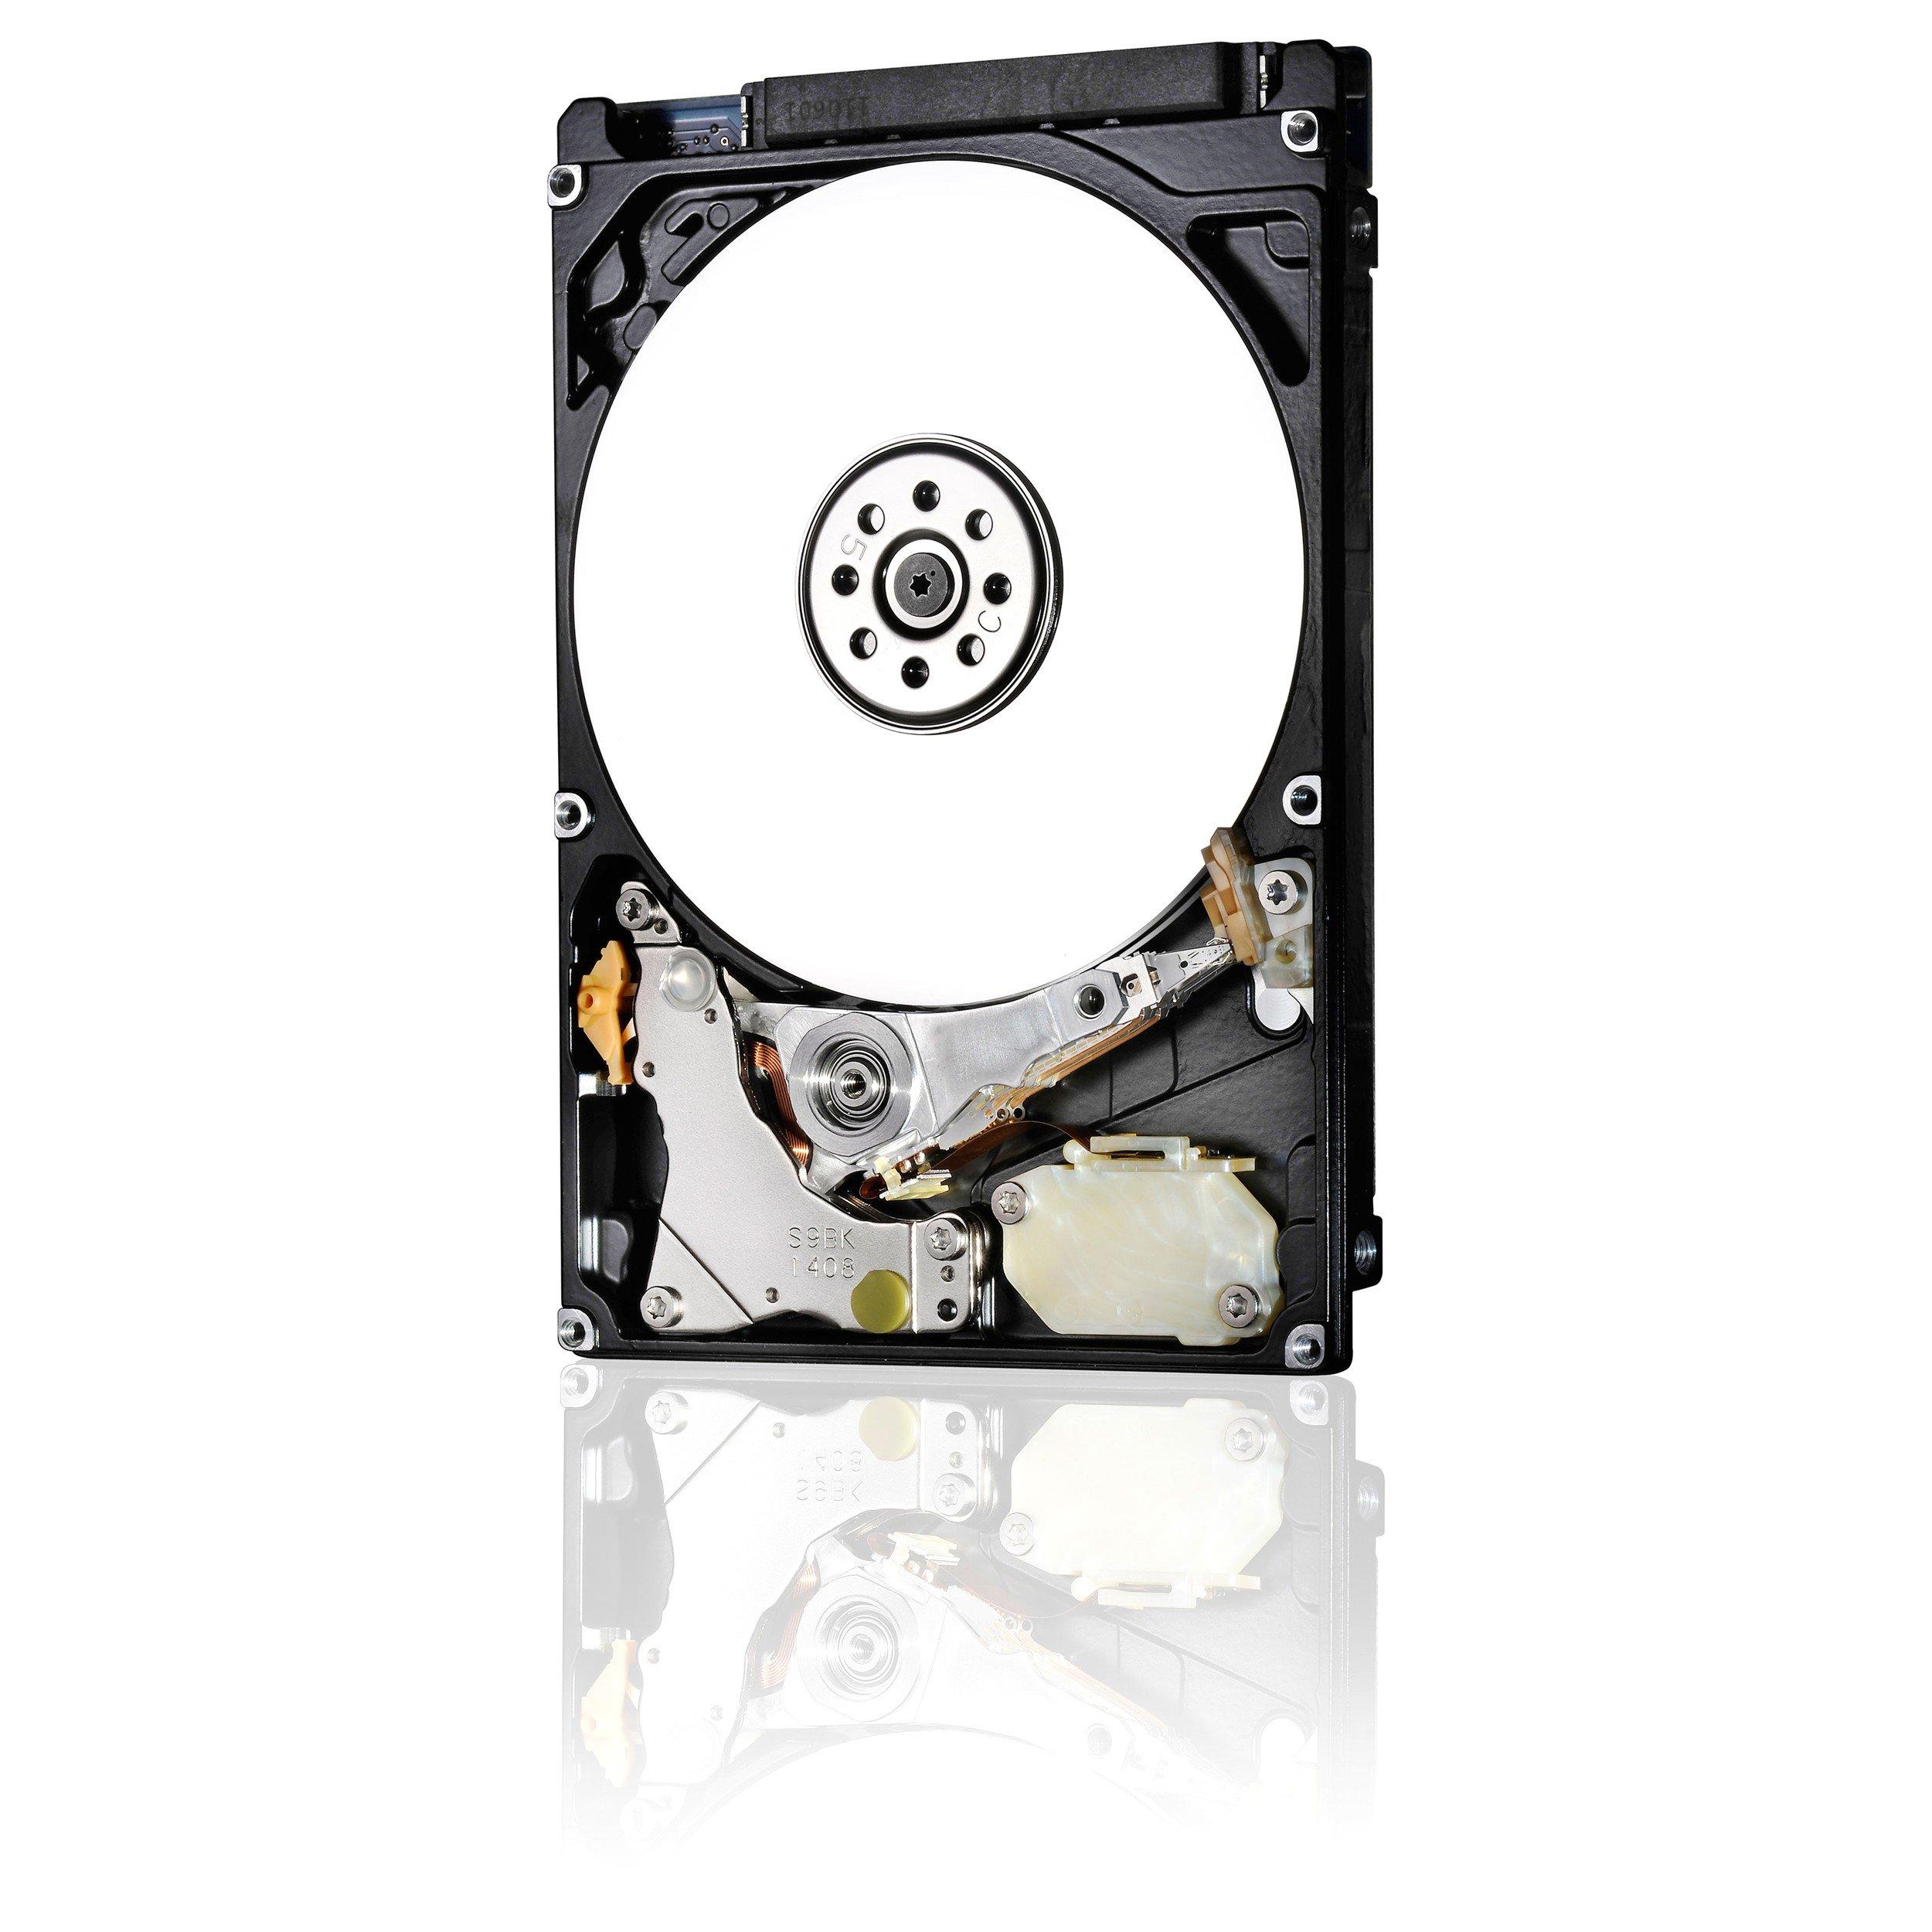 HGST Corporation 1 TB Laptop Sata Hard Drive 2.5'' Internal 7200 RPM HTS721010A9E630 product image